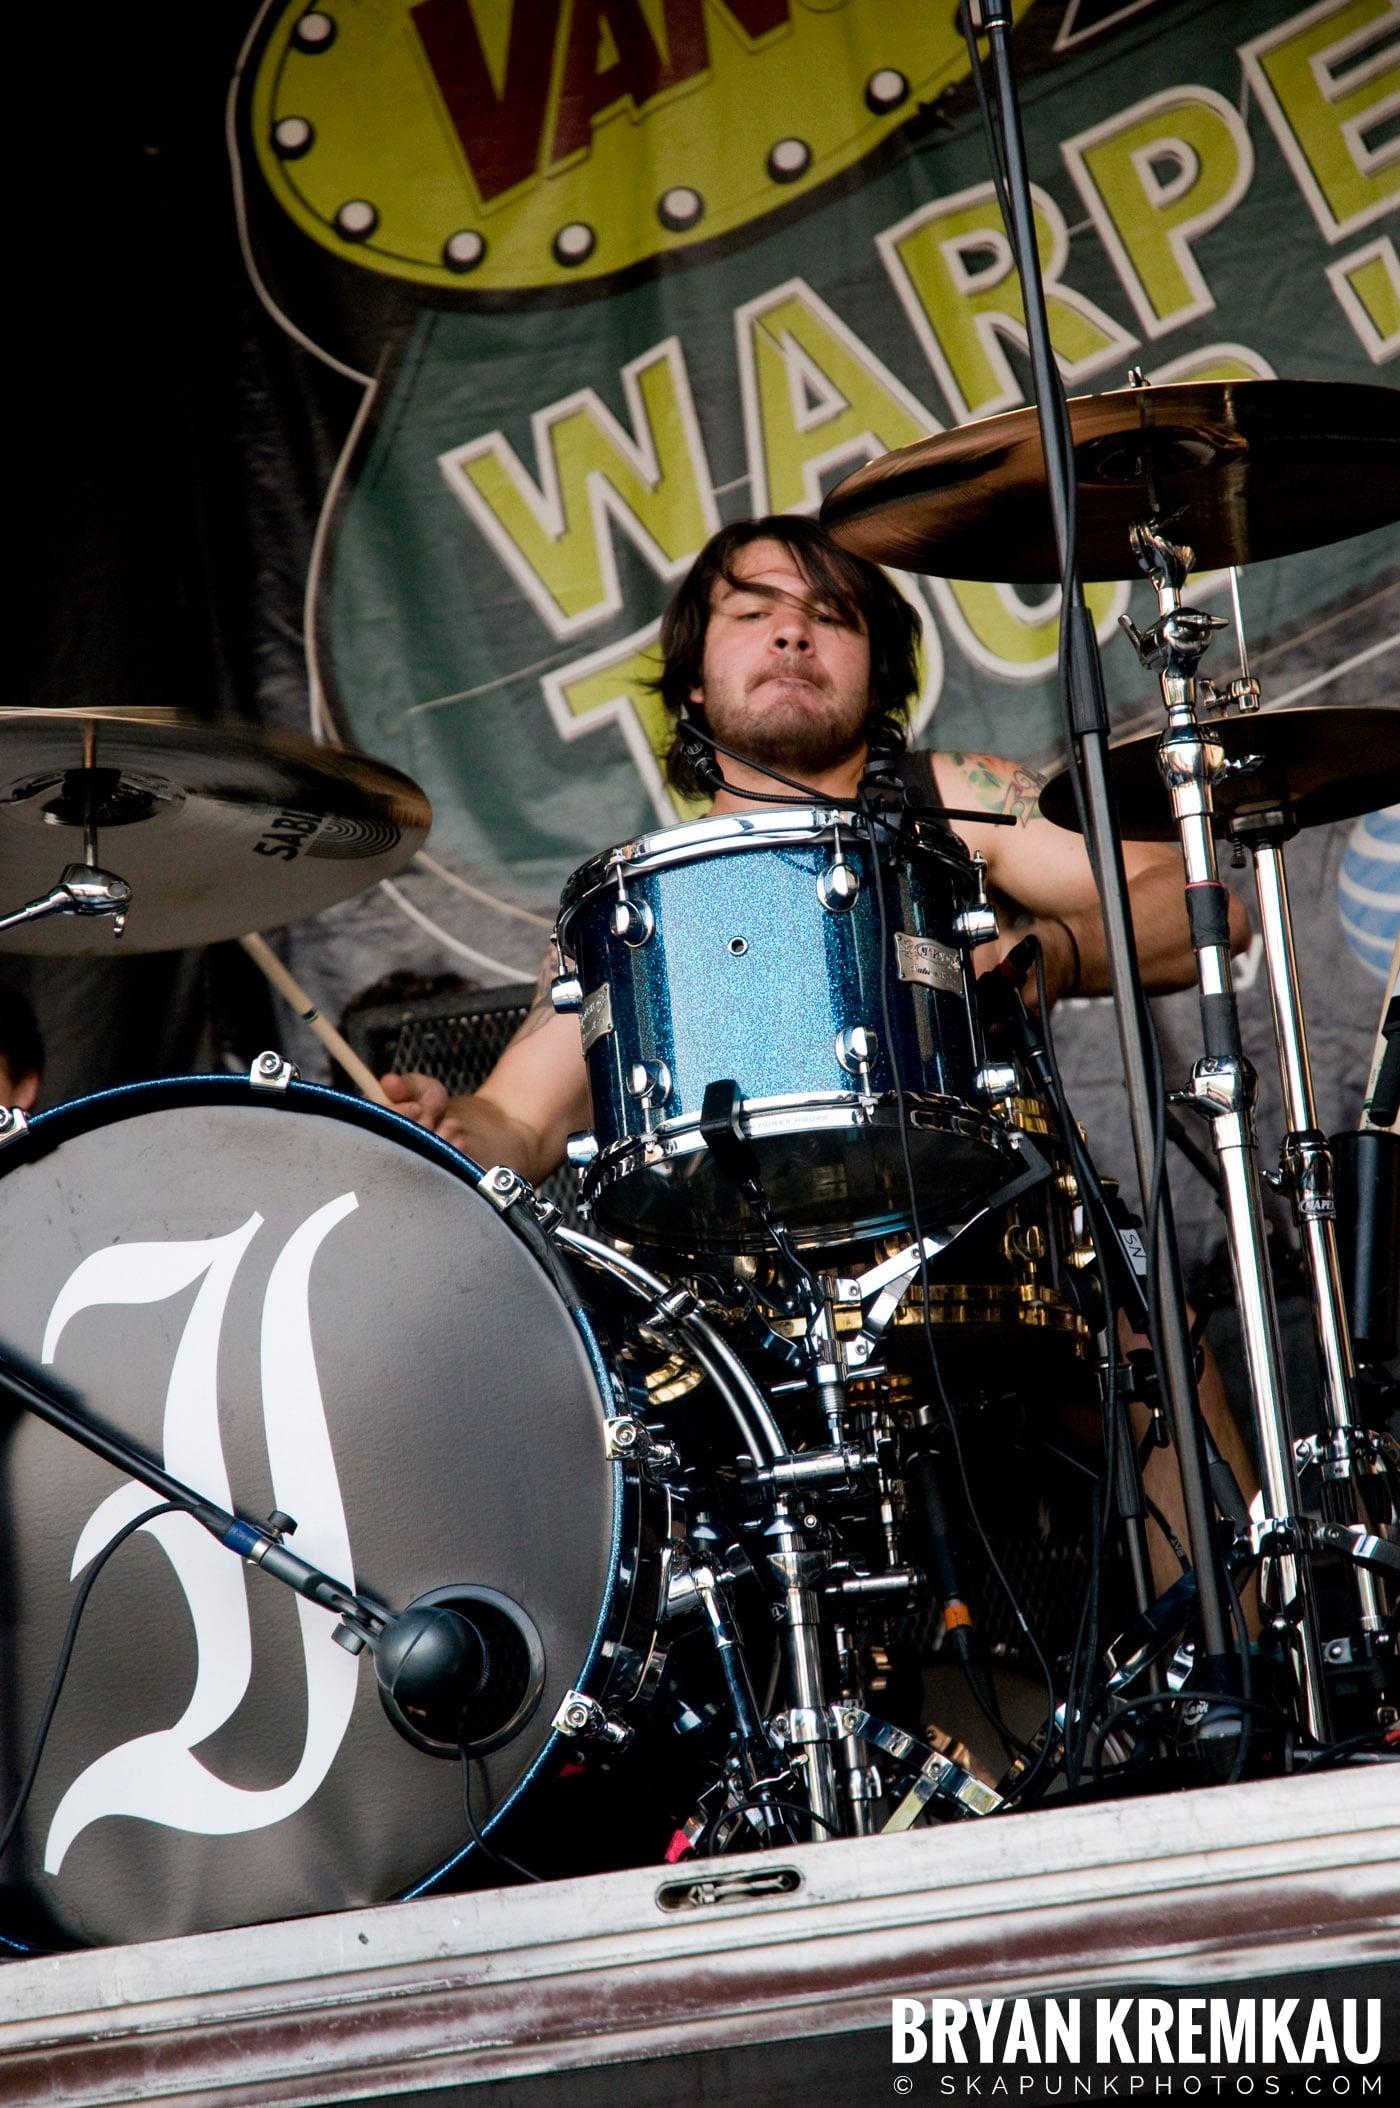 Everytime I Die @ Warped Tour 08, Scranton PA - 7.27.08 (11)